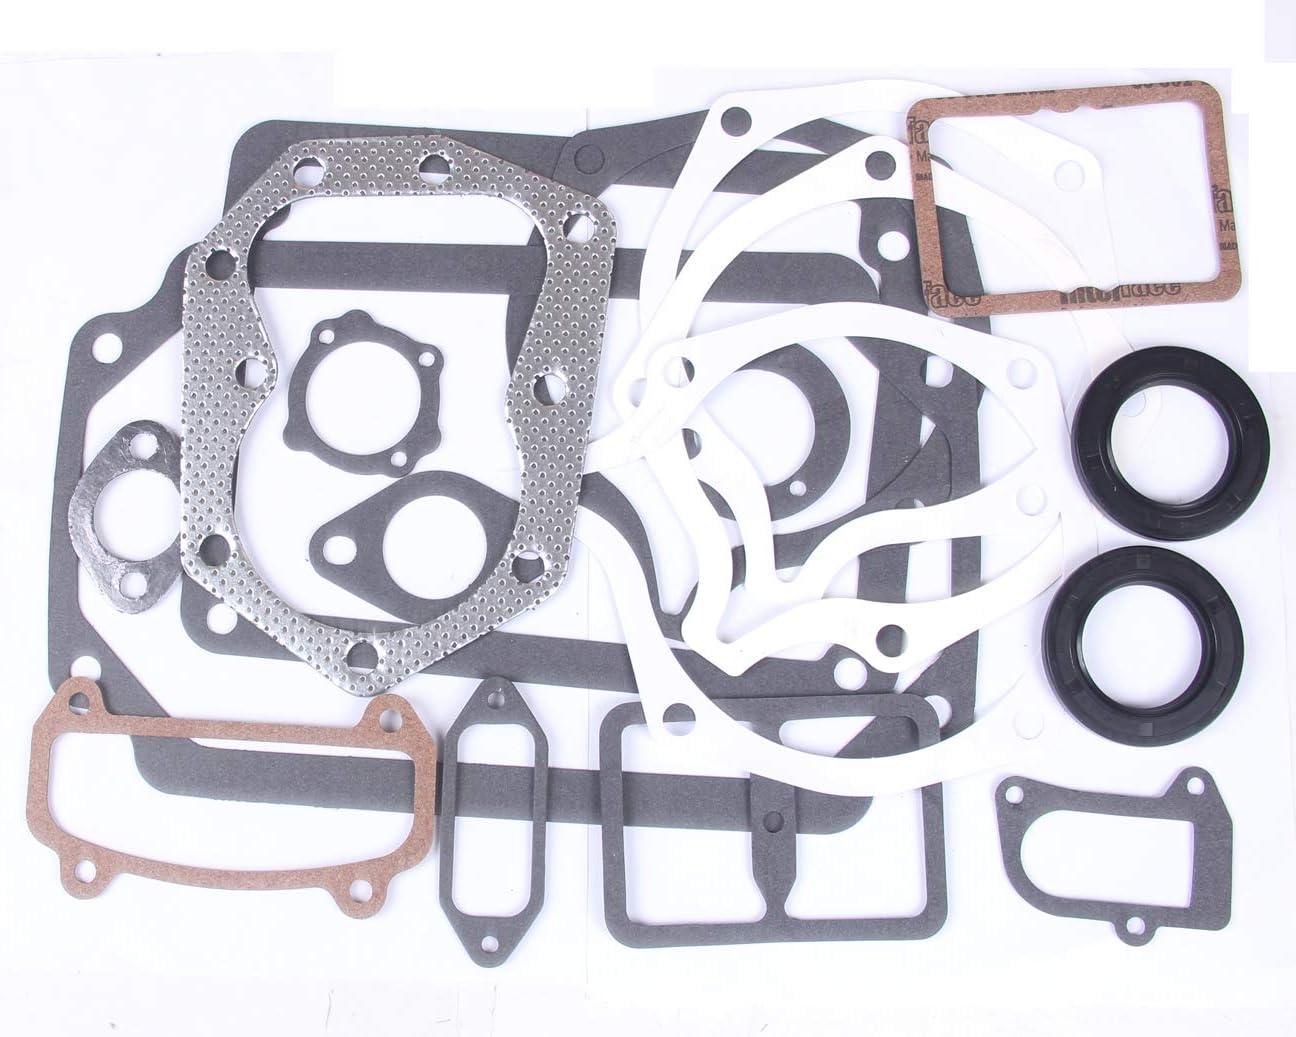 BH-Motor New Gasket Set for Kohler K241 K301 K321 10 12 14 hp Engines Walk Mowers 47 755 08-S